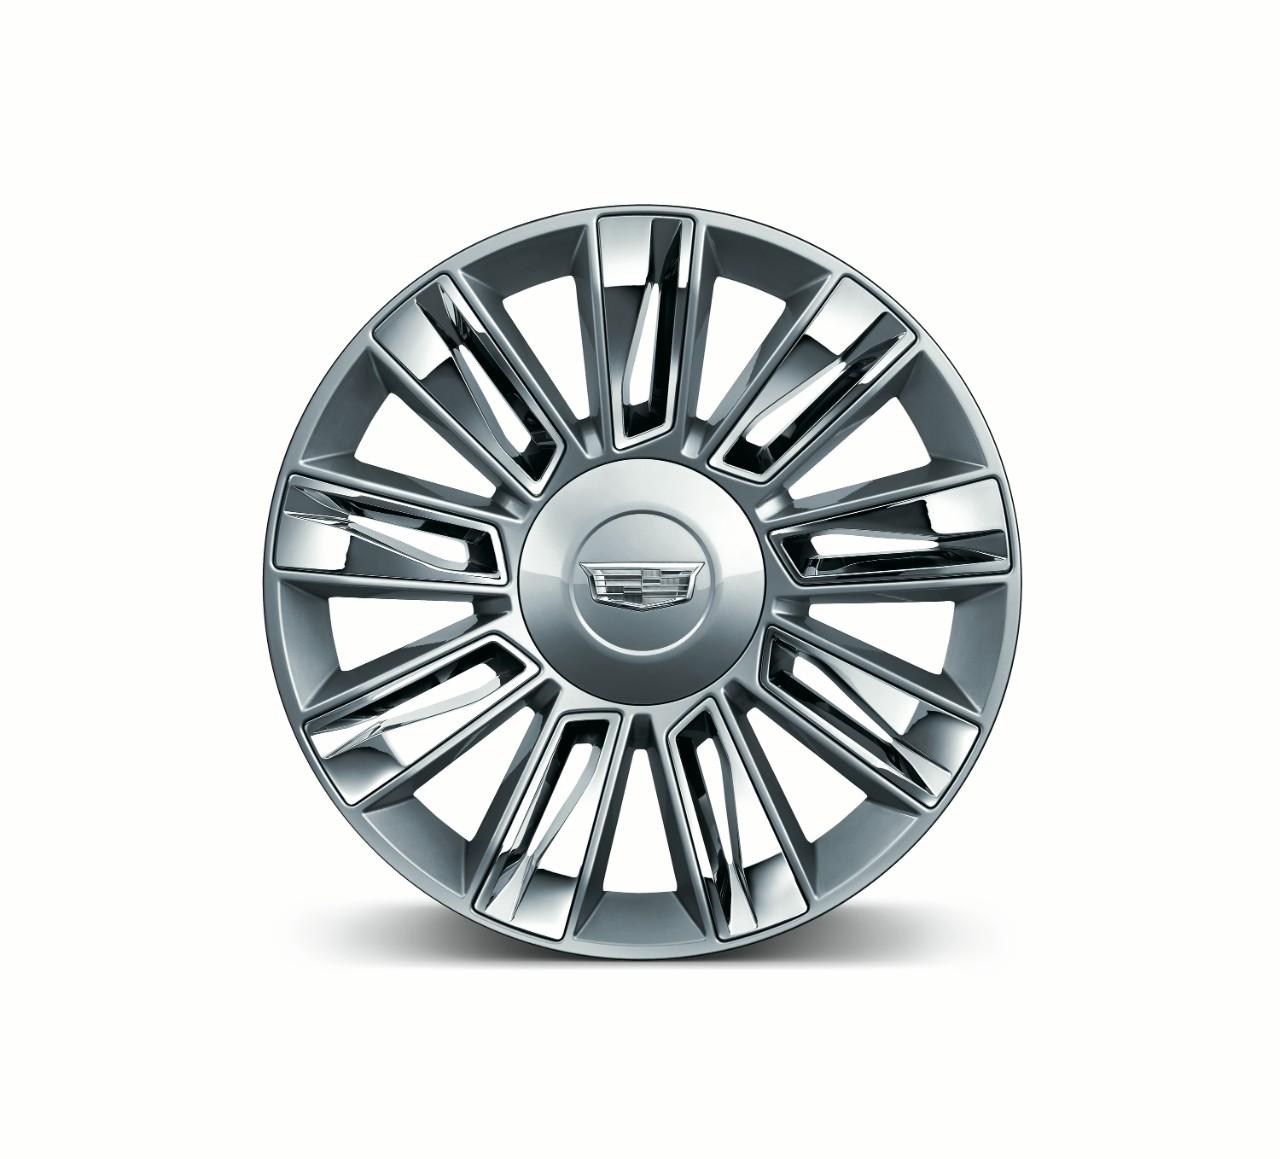 2015 Cadillac Escalade Platinum wheel